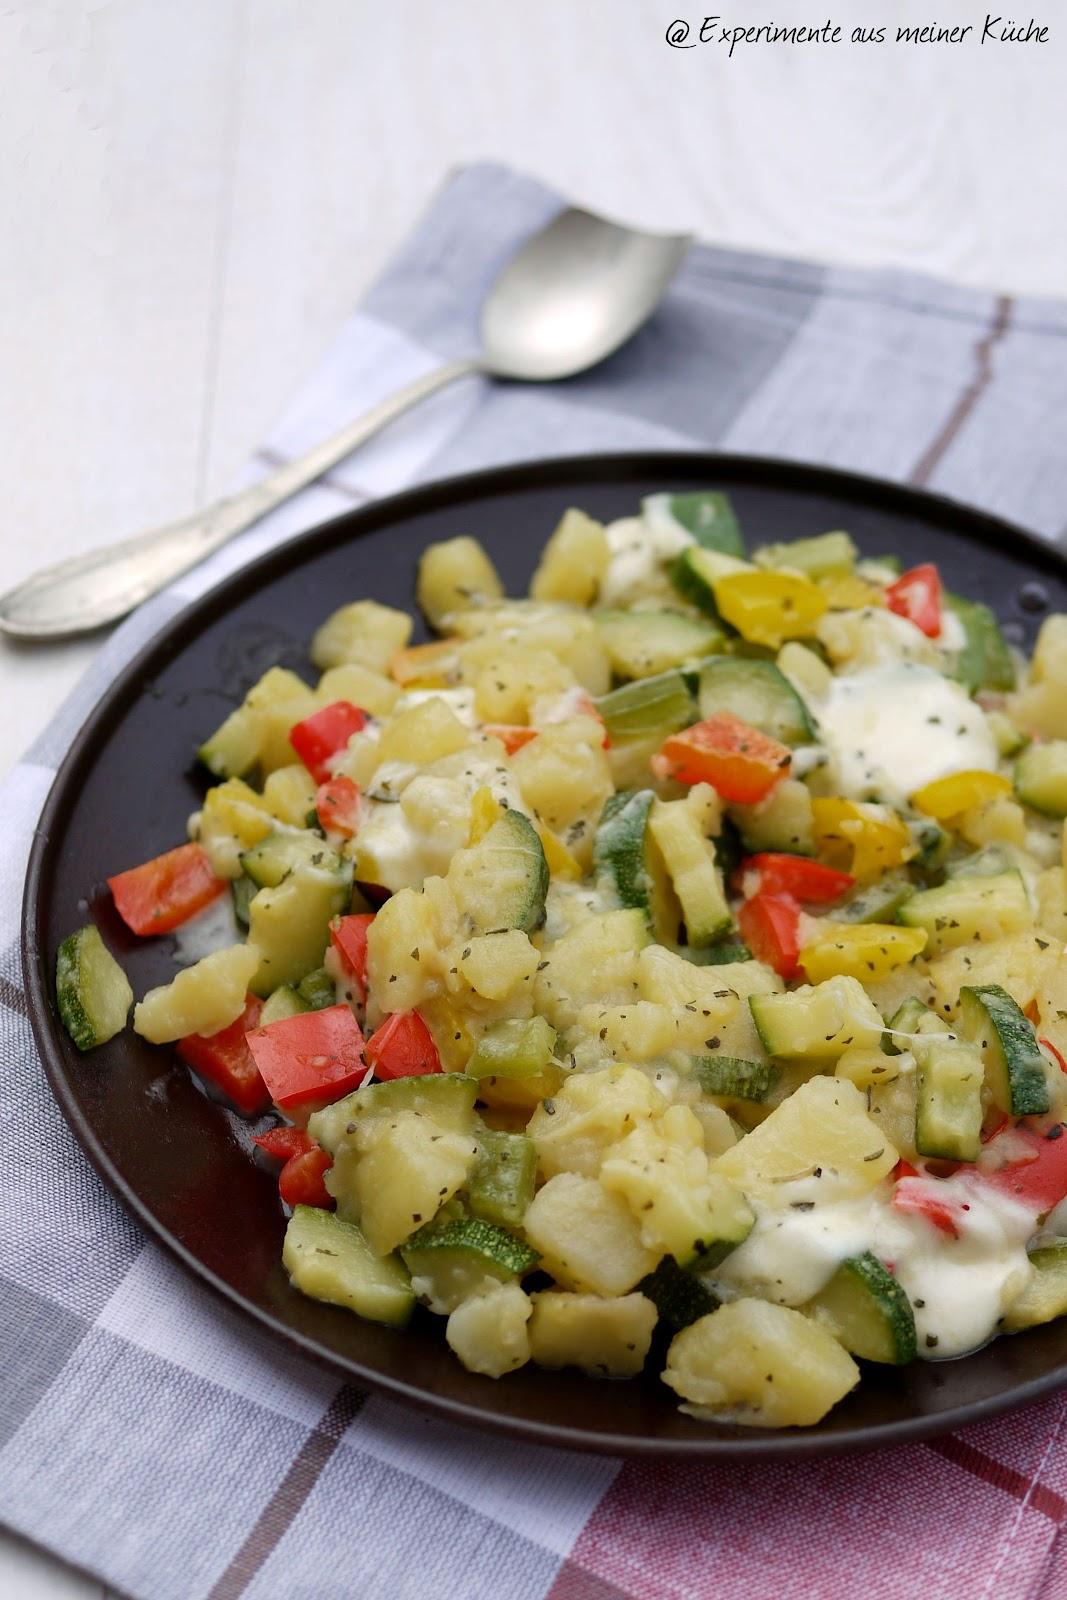 Blog undaion mediterrane Ernährung